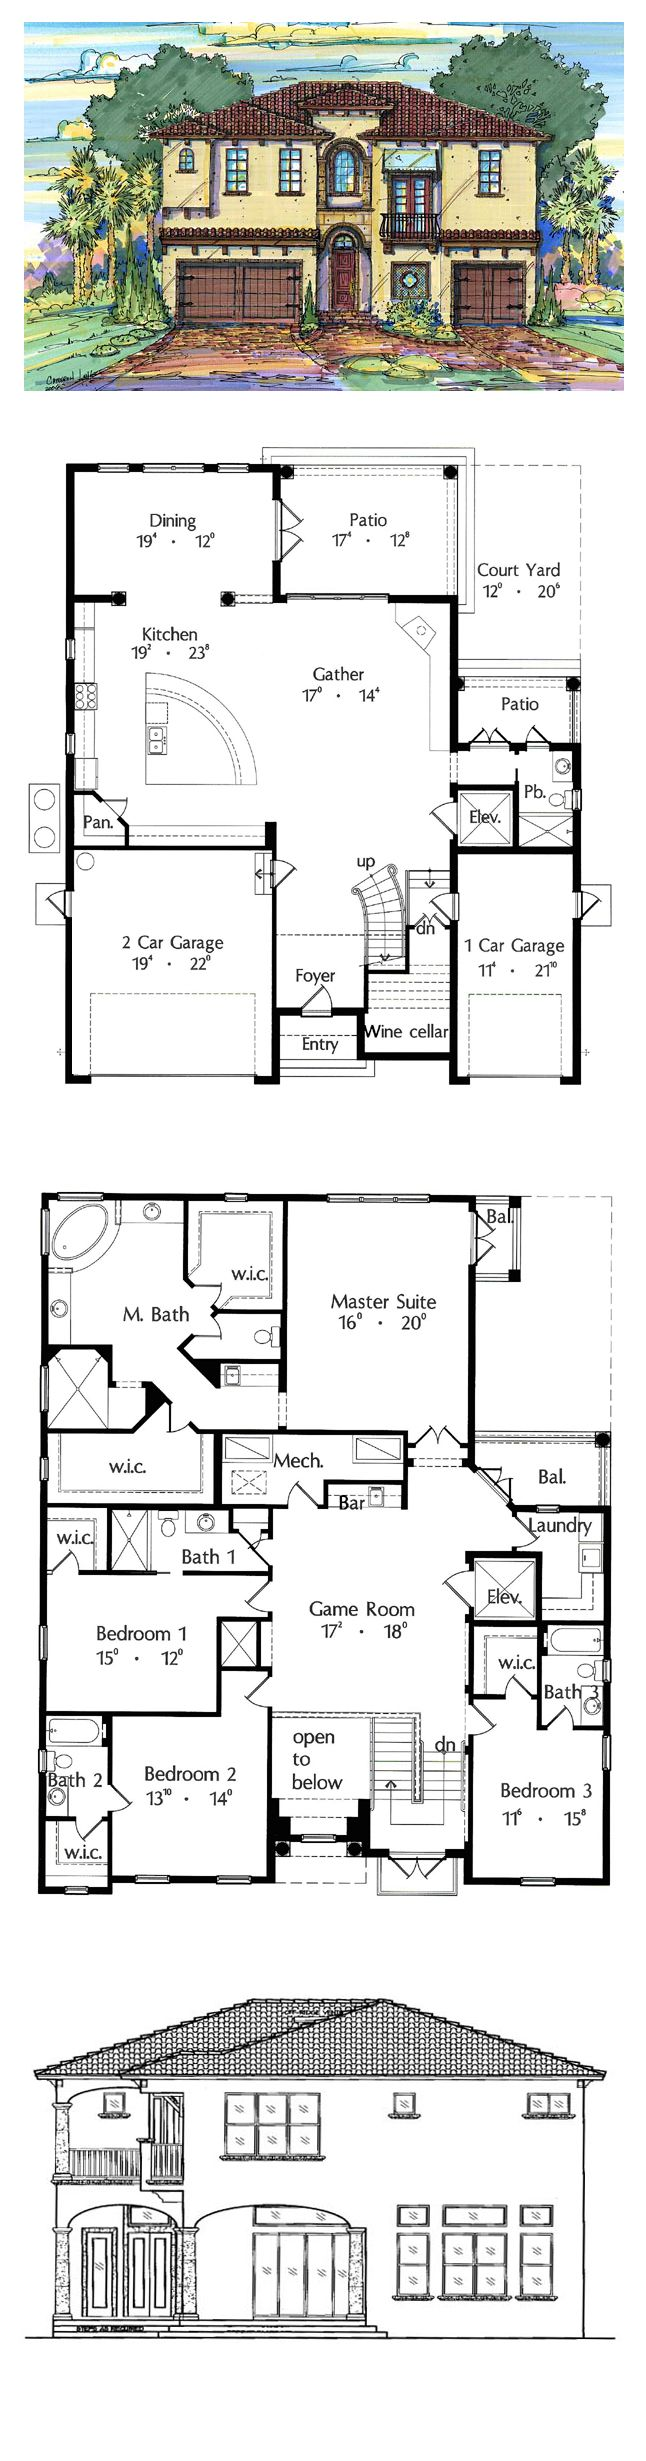 Italian House Plan 64640 | Total Living Area: 3394 sq. ft., 4 bedrooms & 4.5 bathrooms. #houseplan #italianstyle